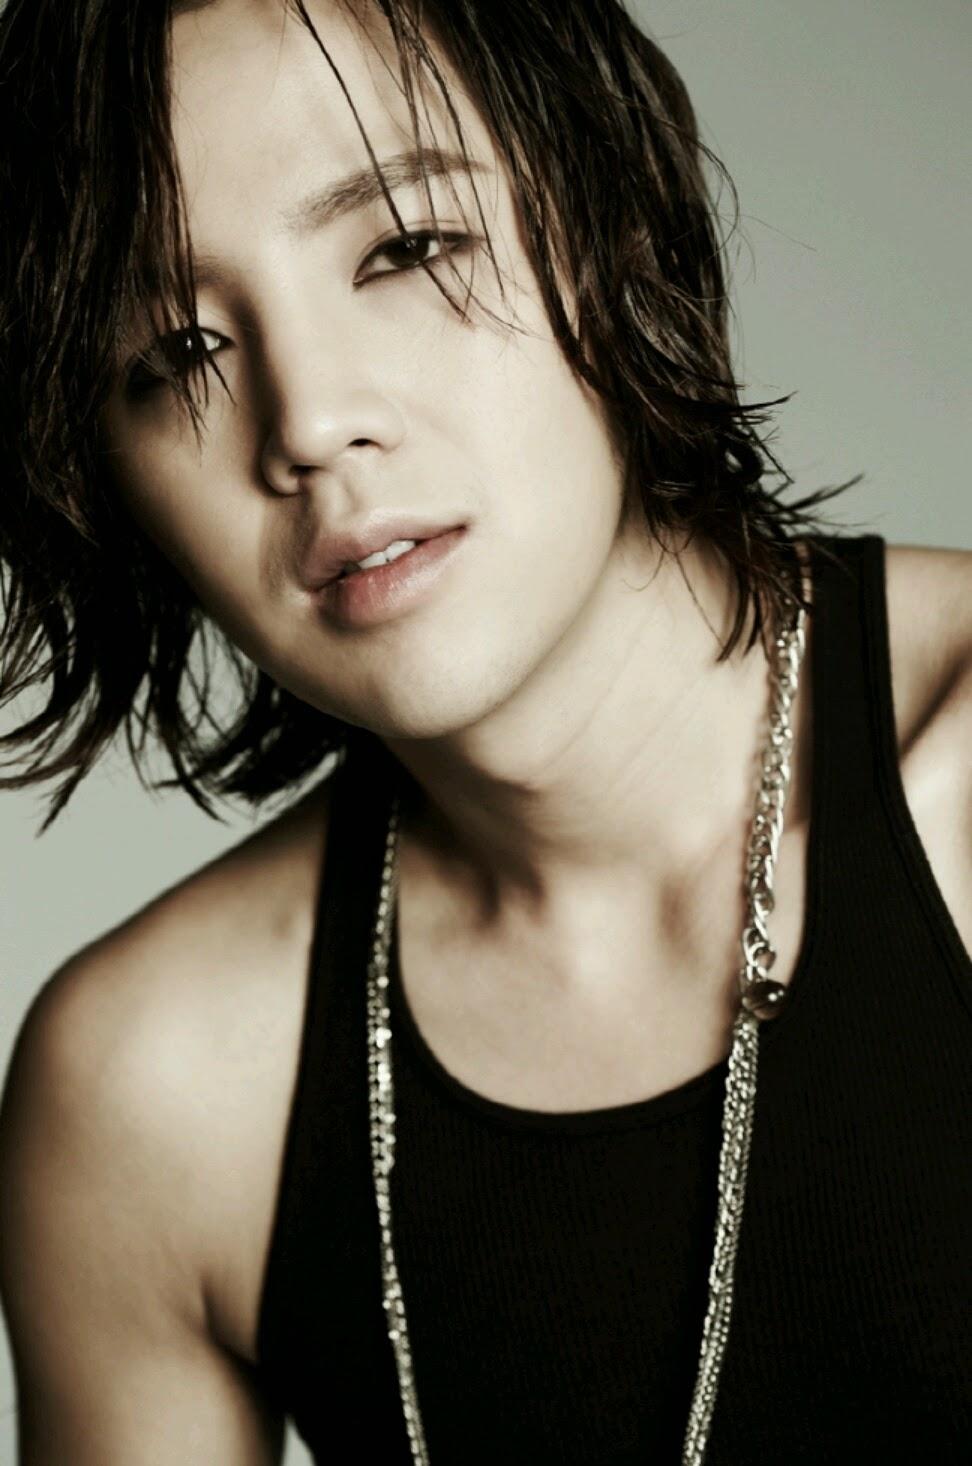 Geun suk shin hye dating service 1